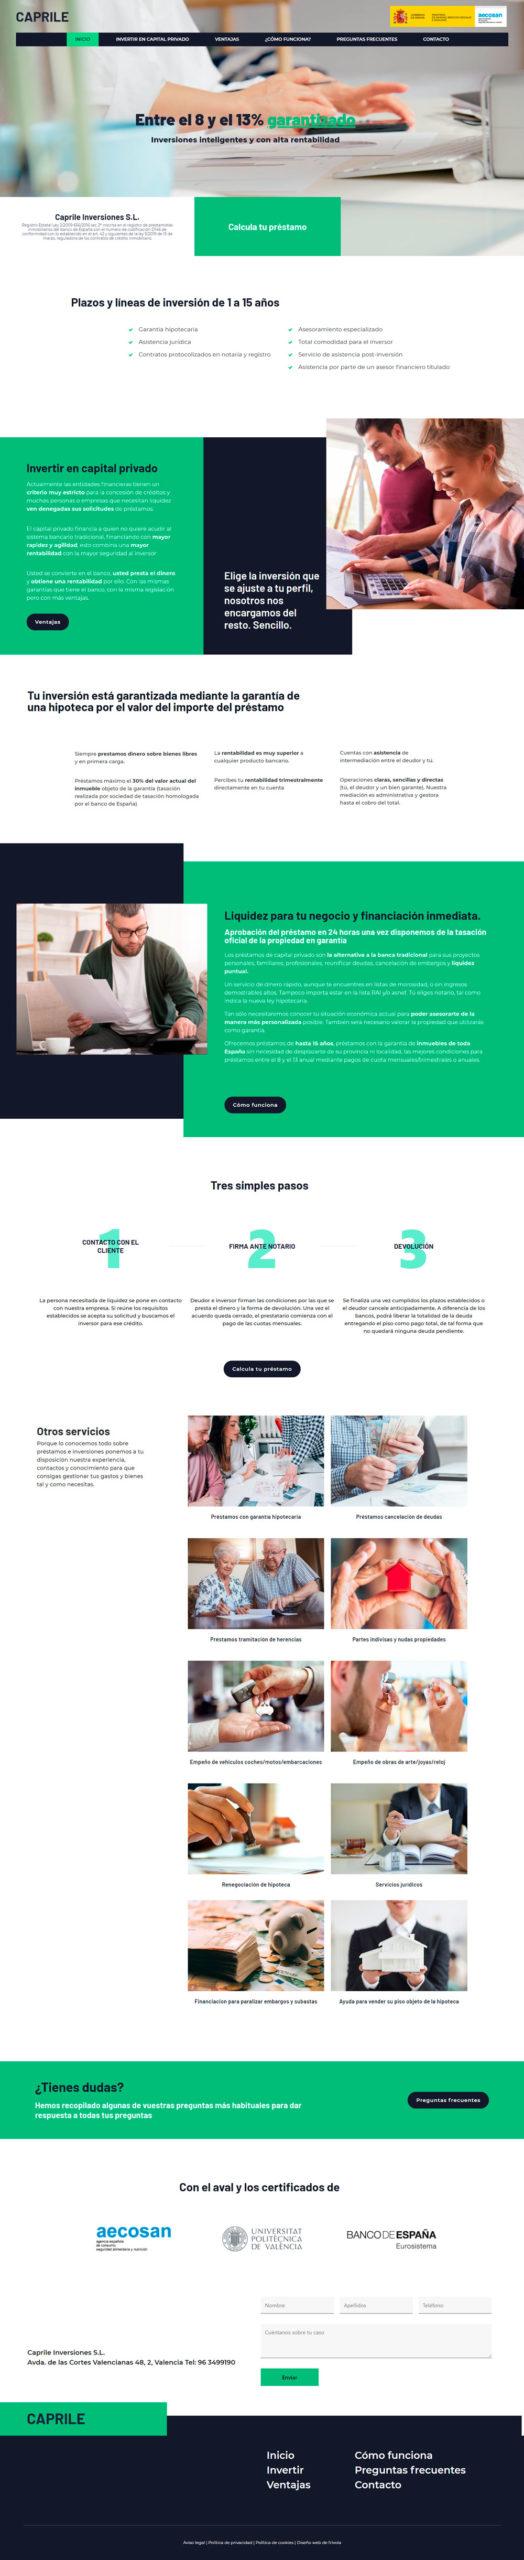 diseño web tipo one page • Capital Privado Levante